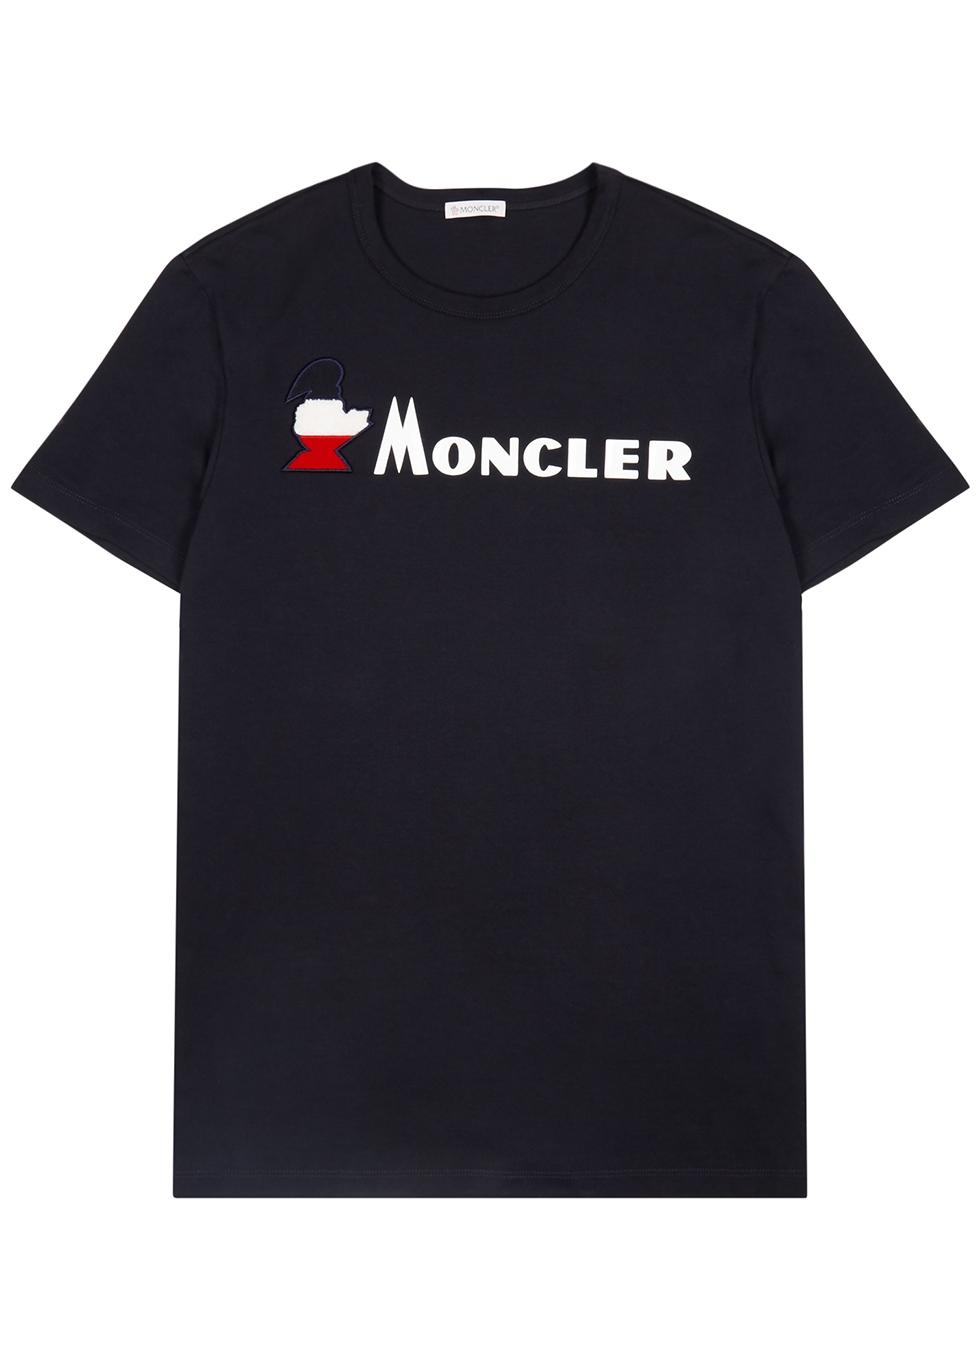 Nichols Nichols Mens Mens Nichols Moncler Moncler Harvey Moncler Mens Harvey Harvey uZikOPX